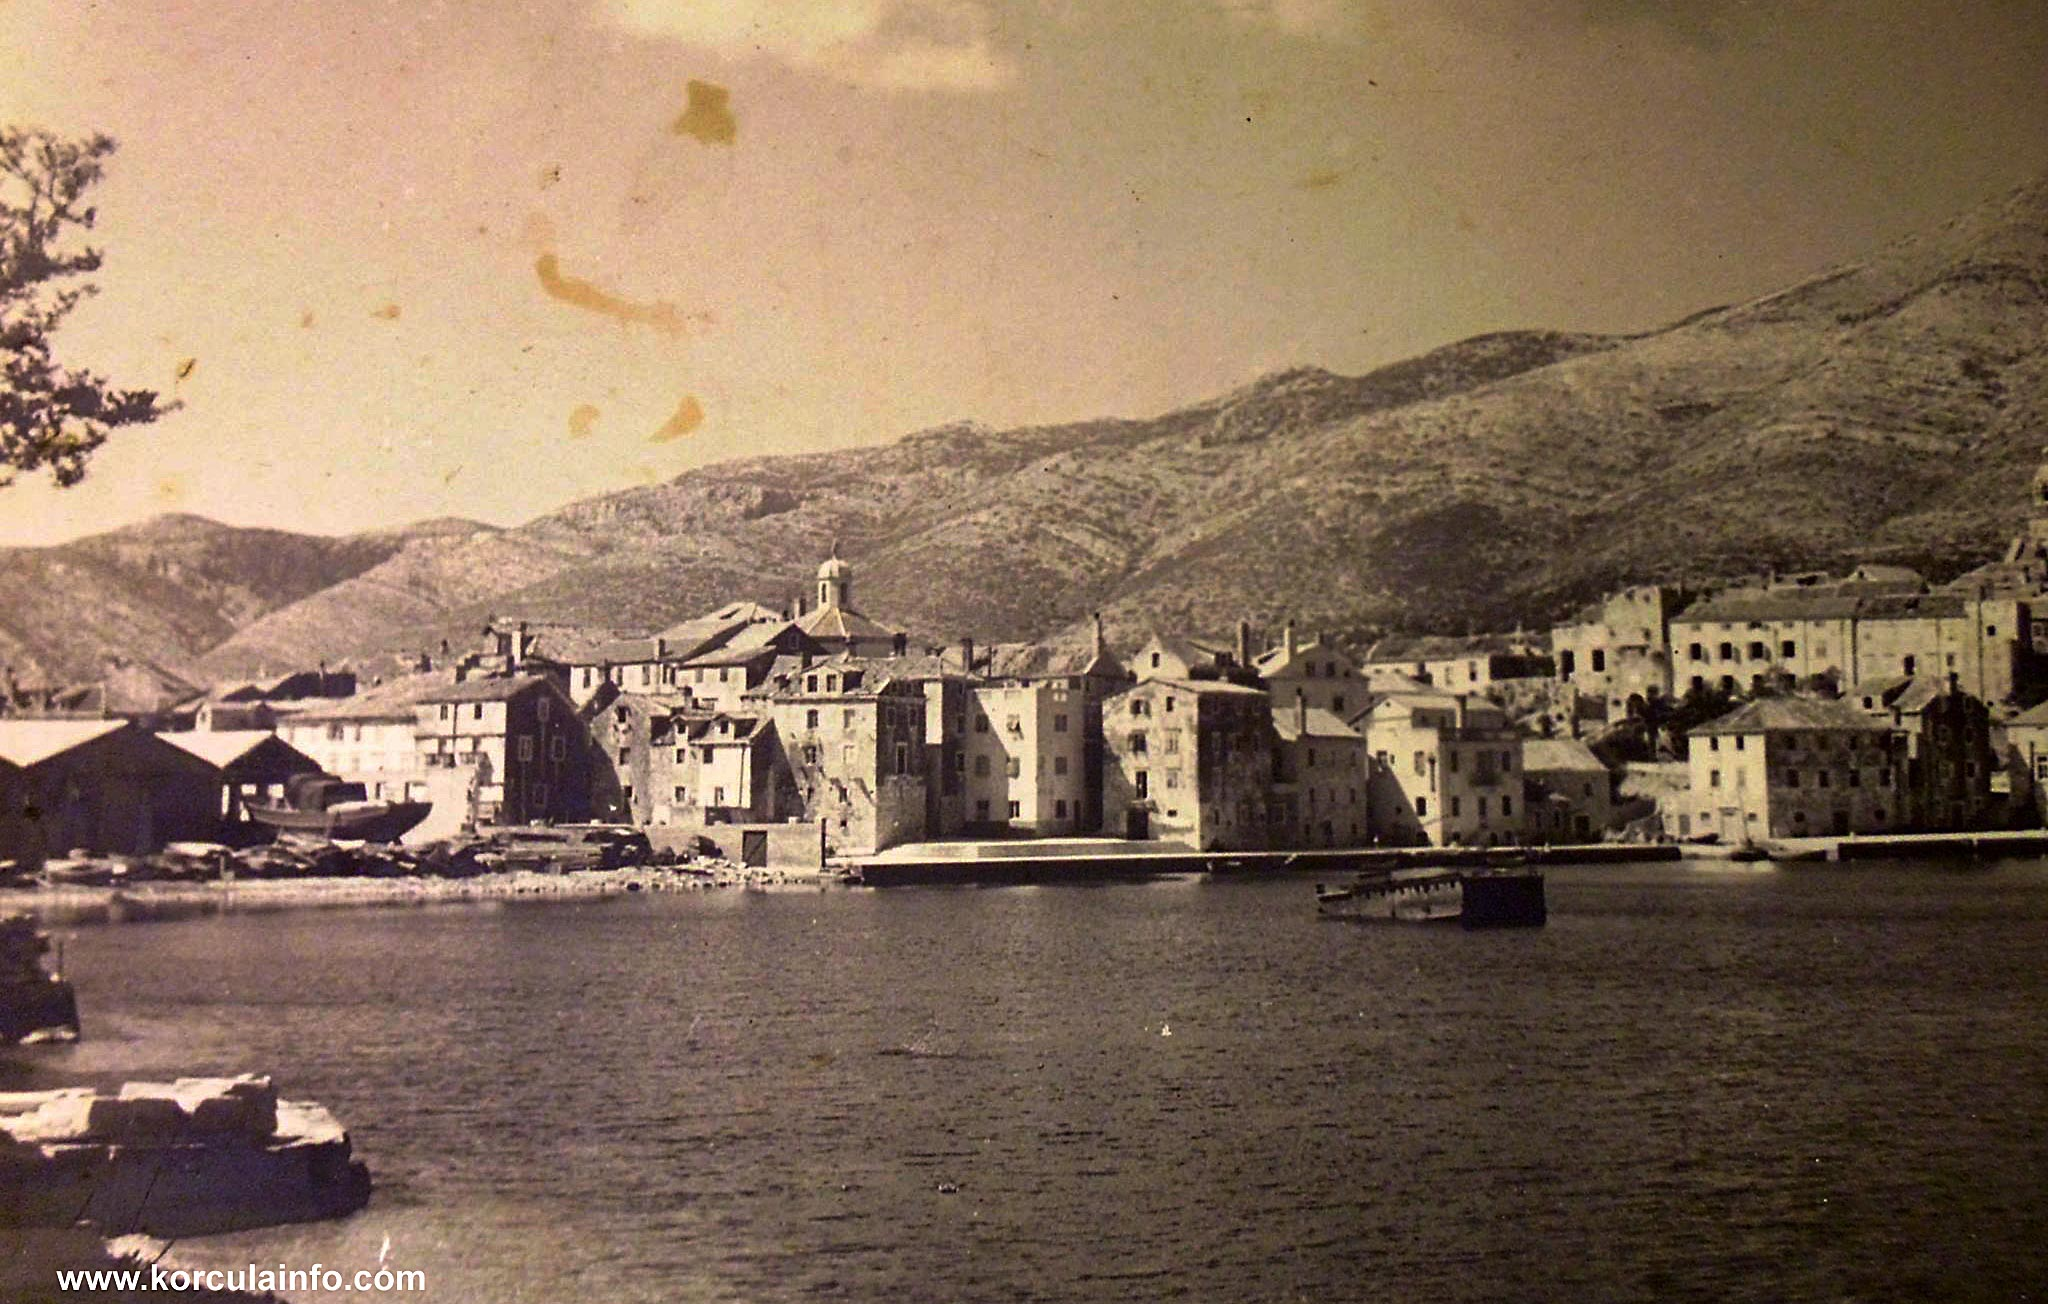 Punta Jurana in 1950s